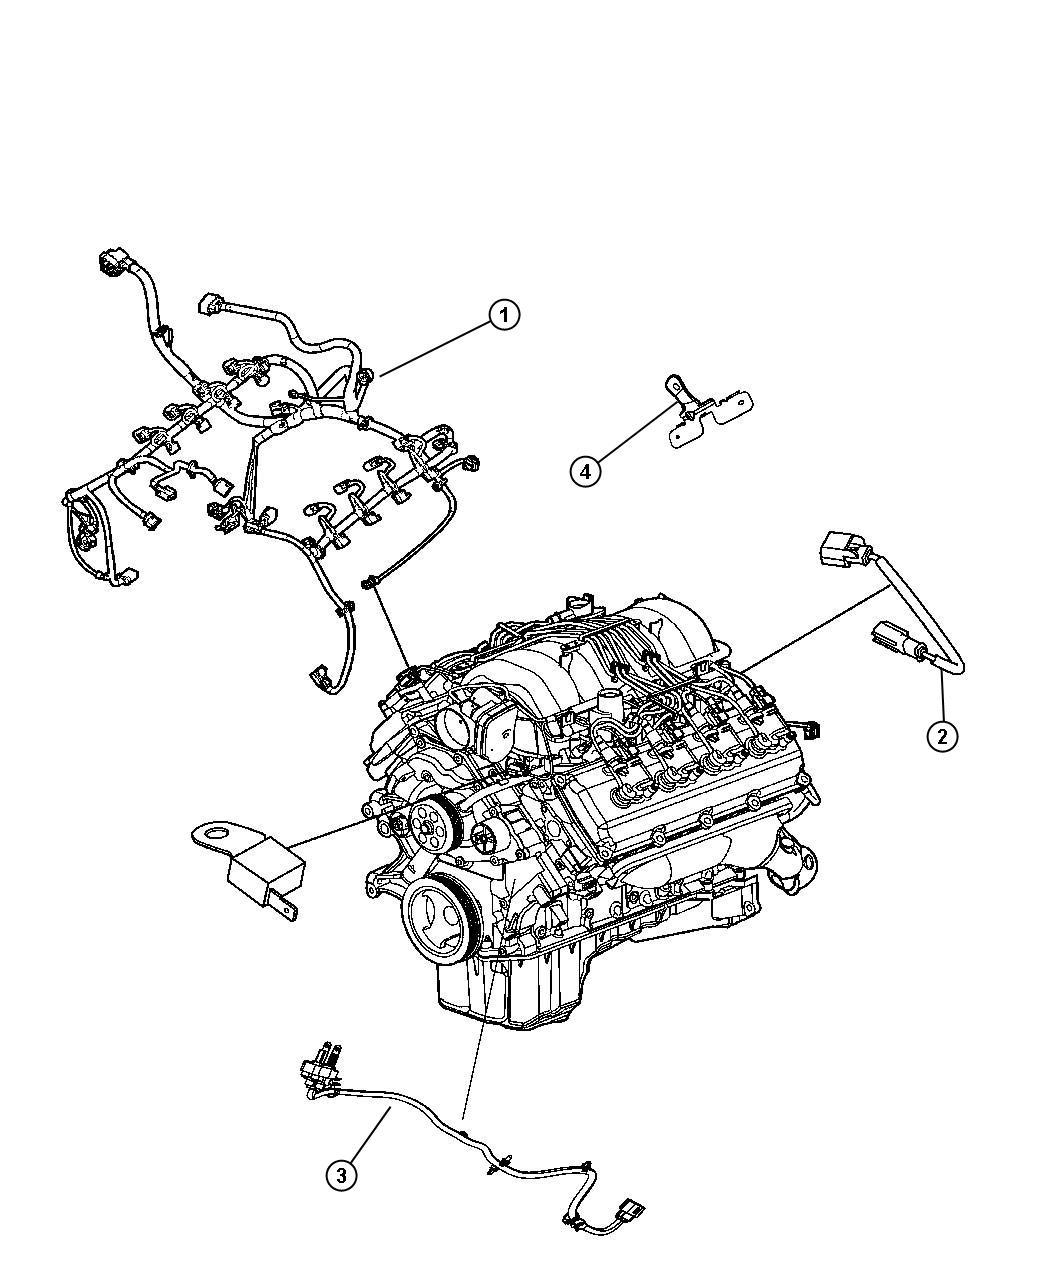 Dodge Ram 1500 Bracket. Engine wiring. Ngc bracket